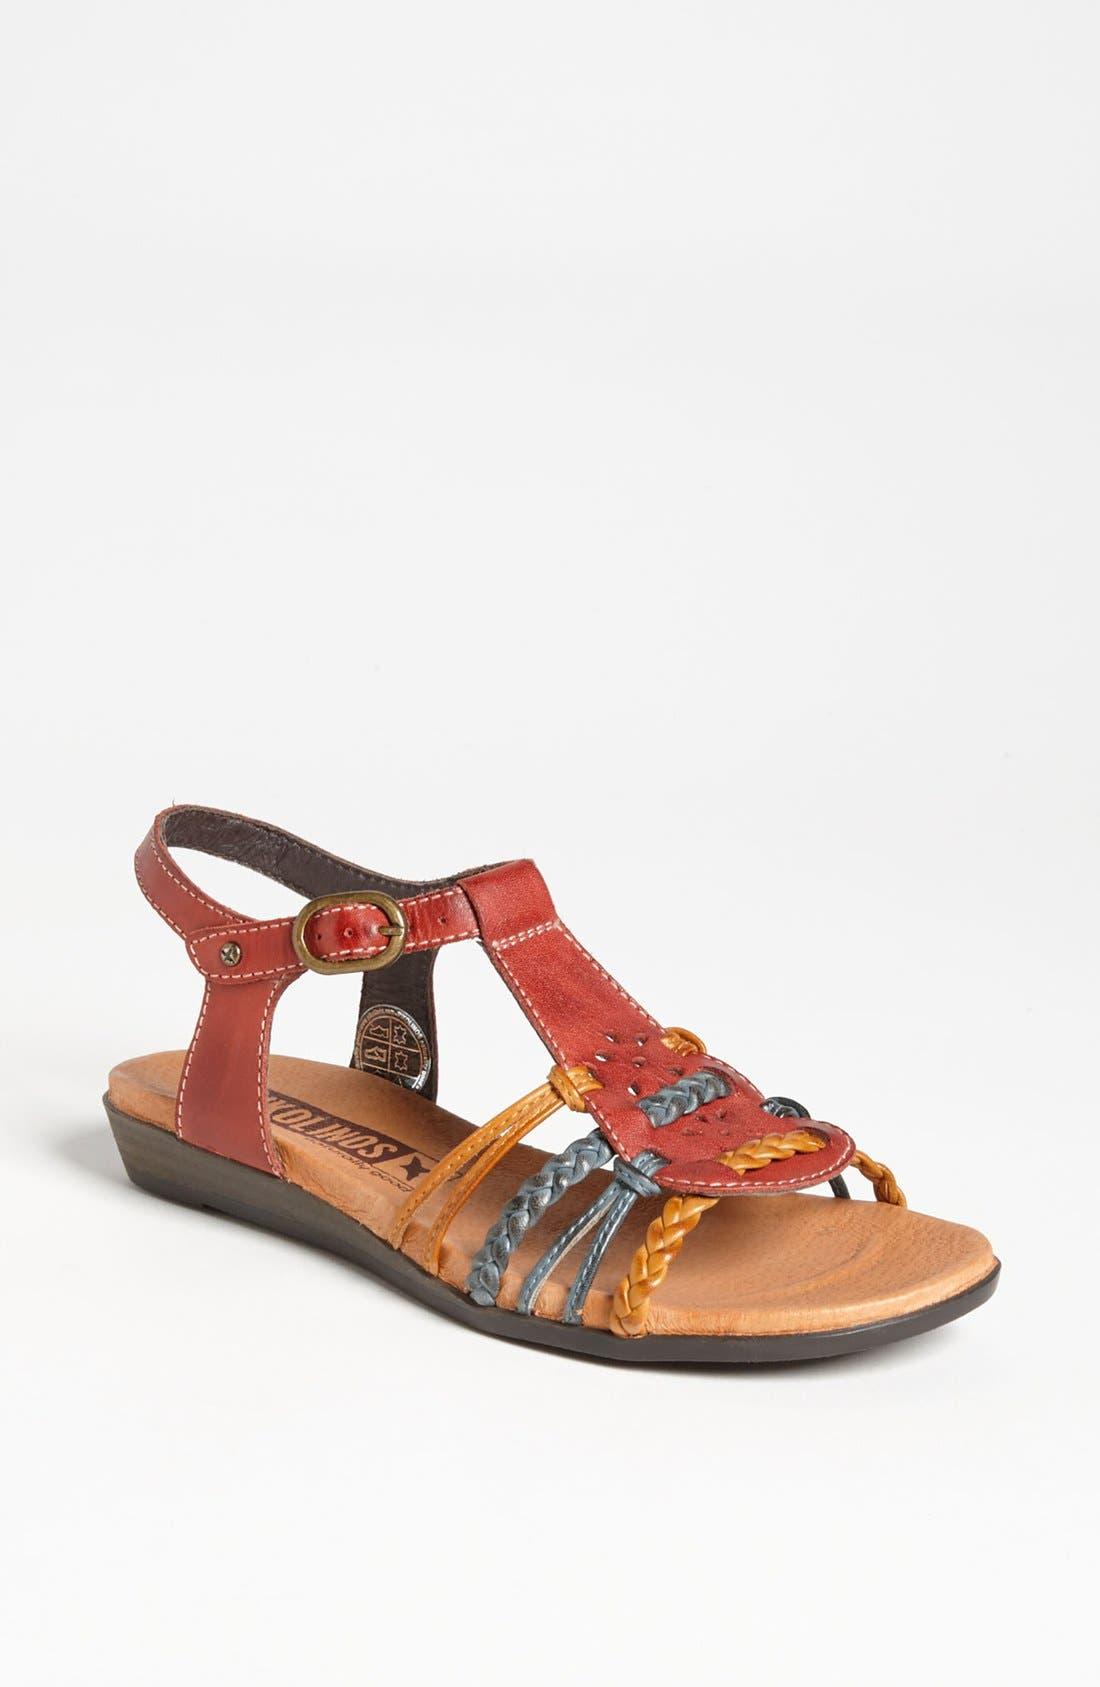 Main Image - PIKOLINOS 'Alcudia' Sandal